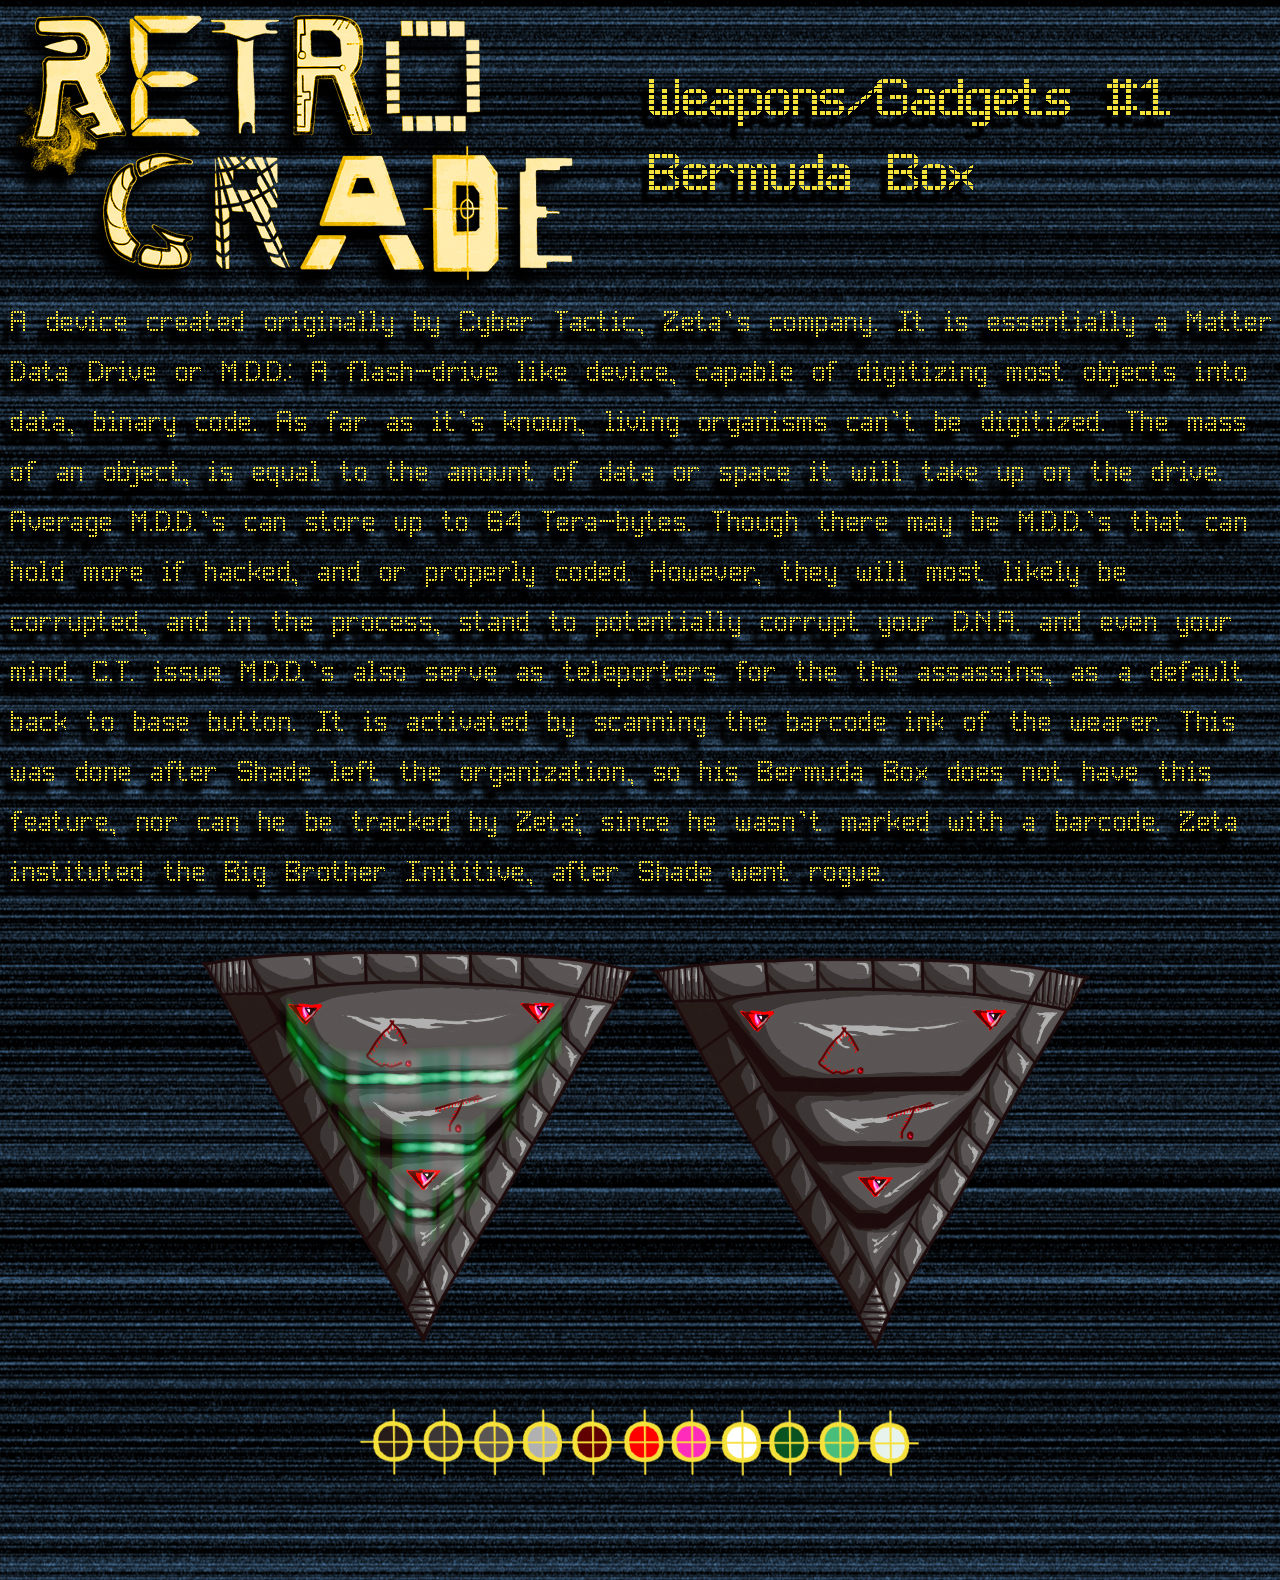 Retrograde Weapon/Gadgets: # 1